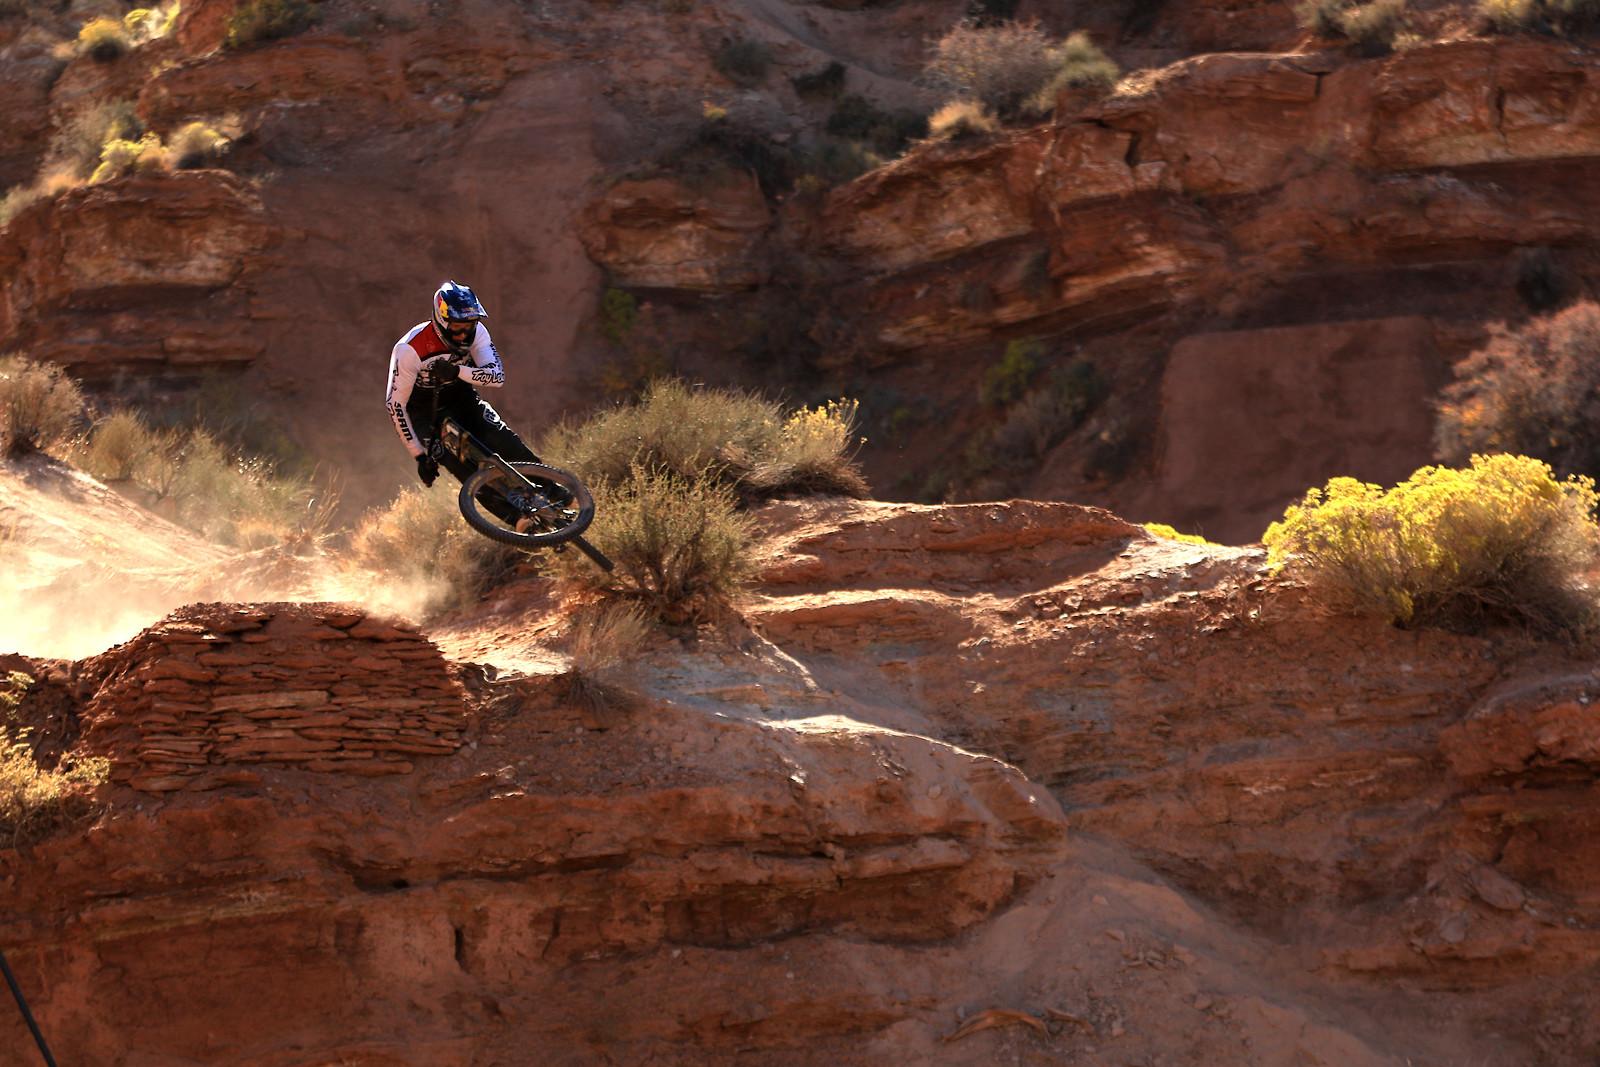 503A5909 - mjmiller613 - Mountain Biking Pictures - Vital MTB